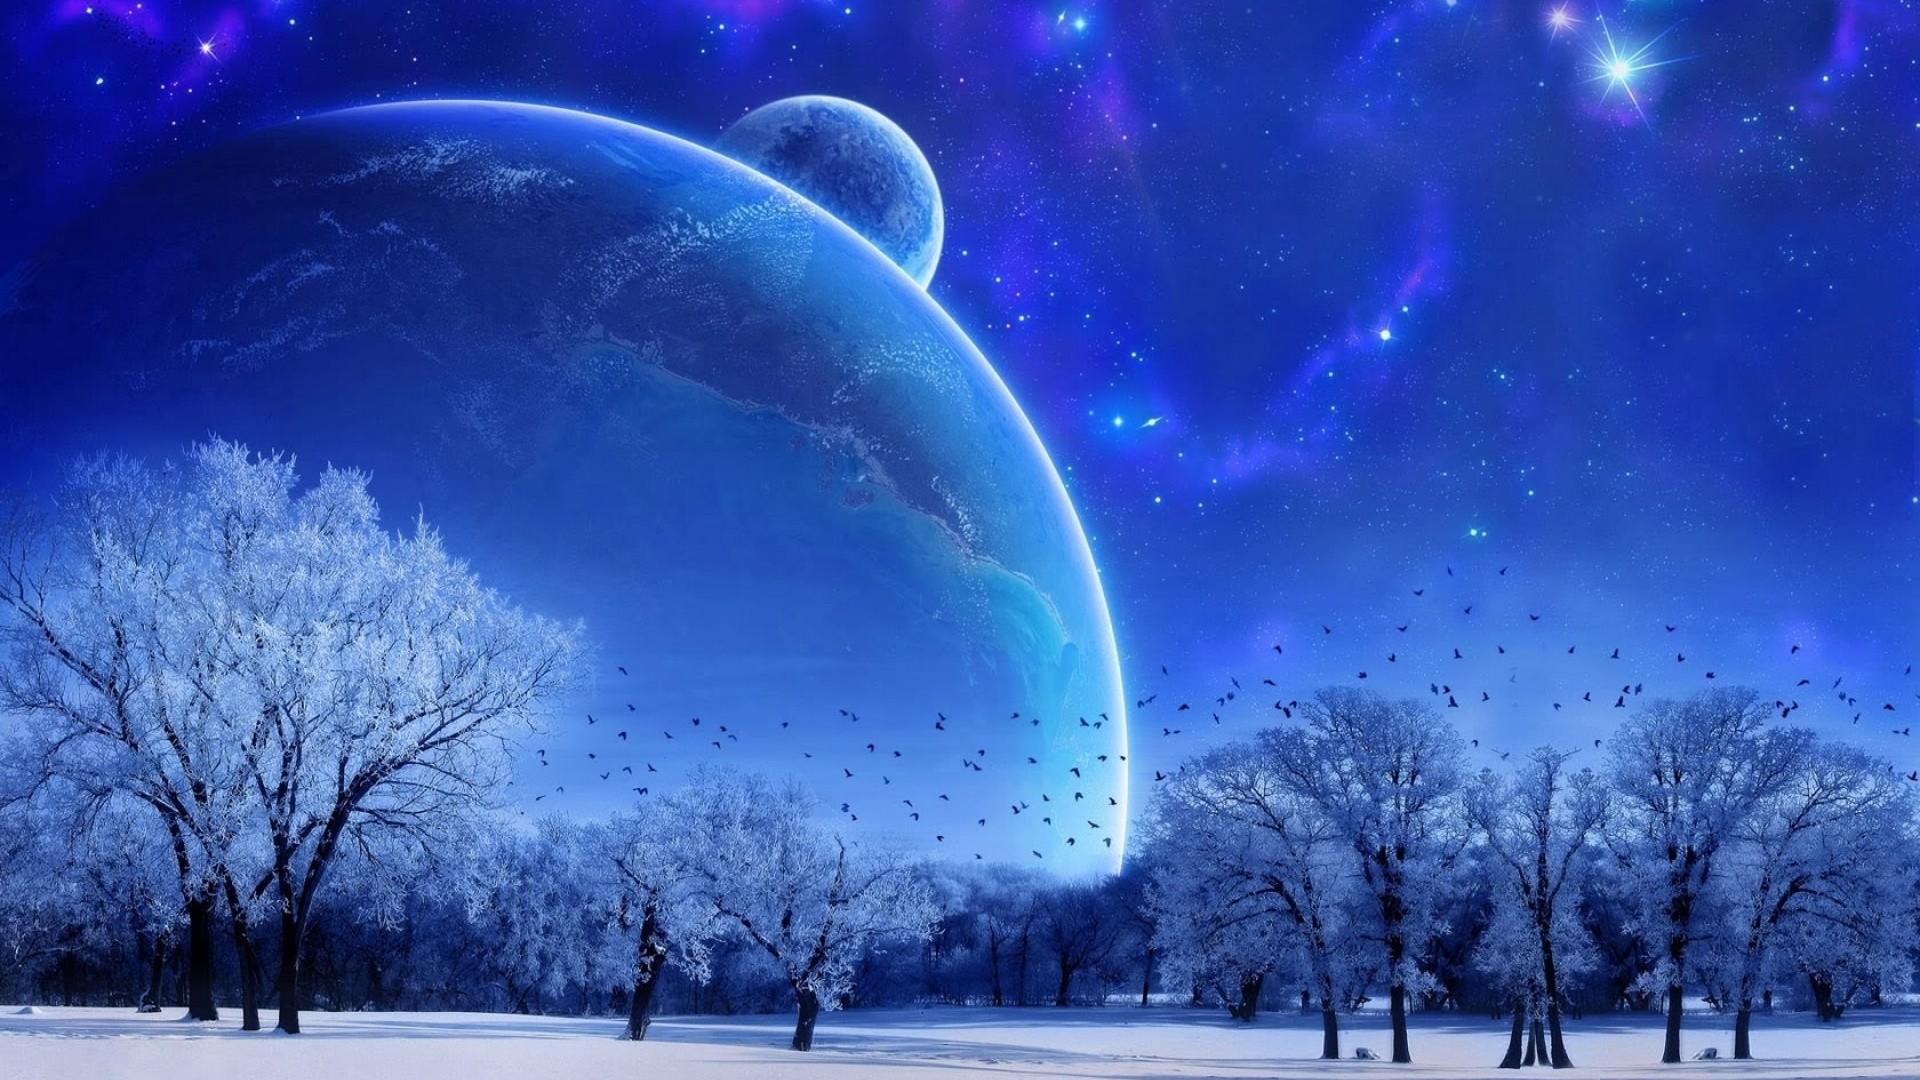 1920x1080 Glows Blue Planet Wallpaper Full HD